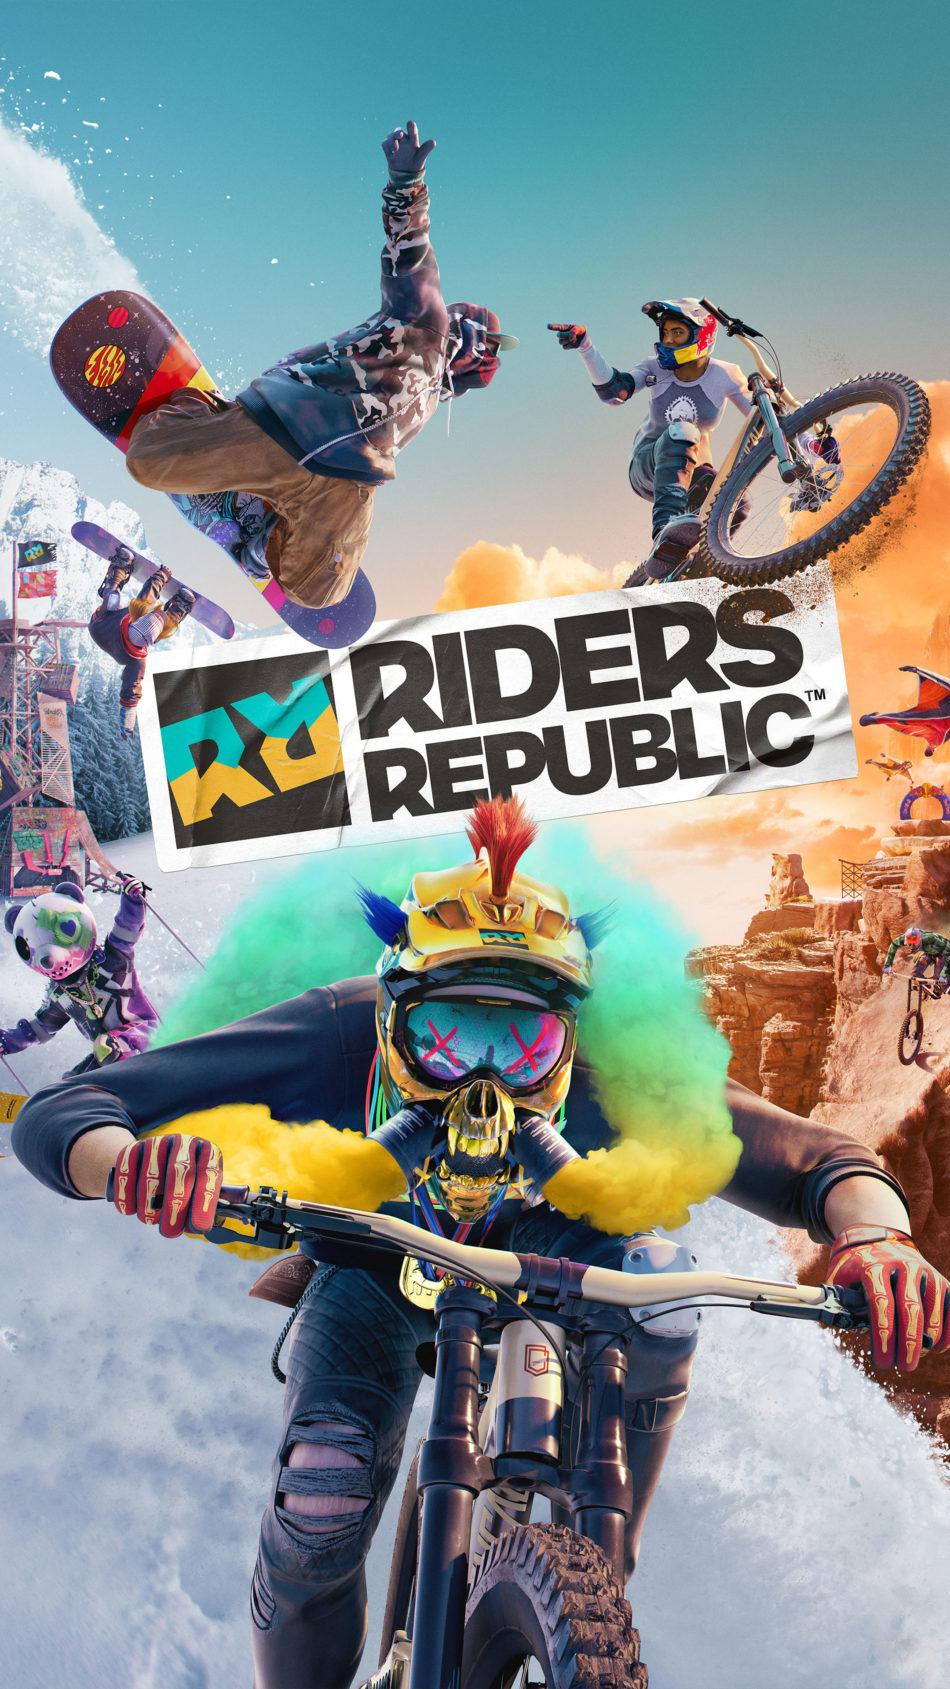 Riders Republic Game Poster 4K Ultra HD Mobile Wallpaper